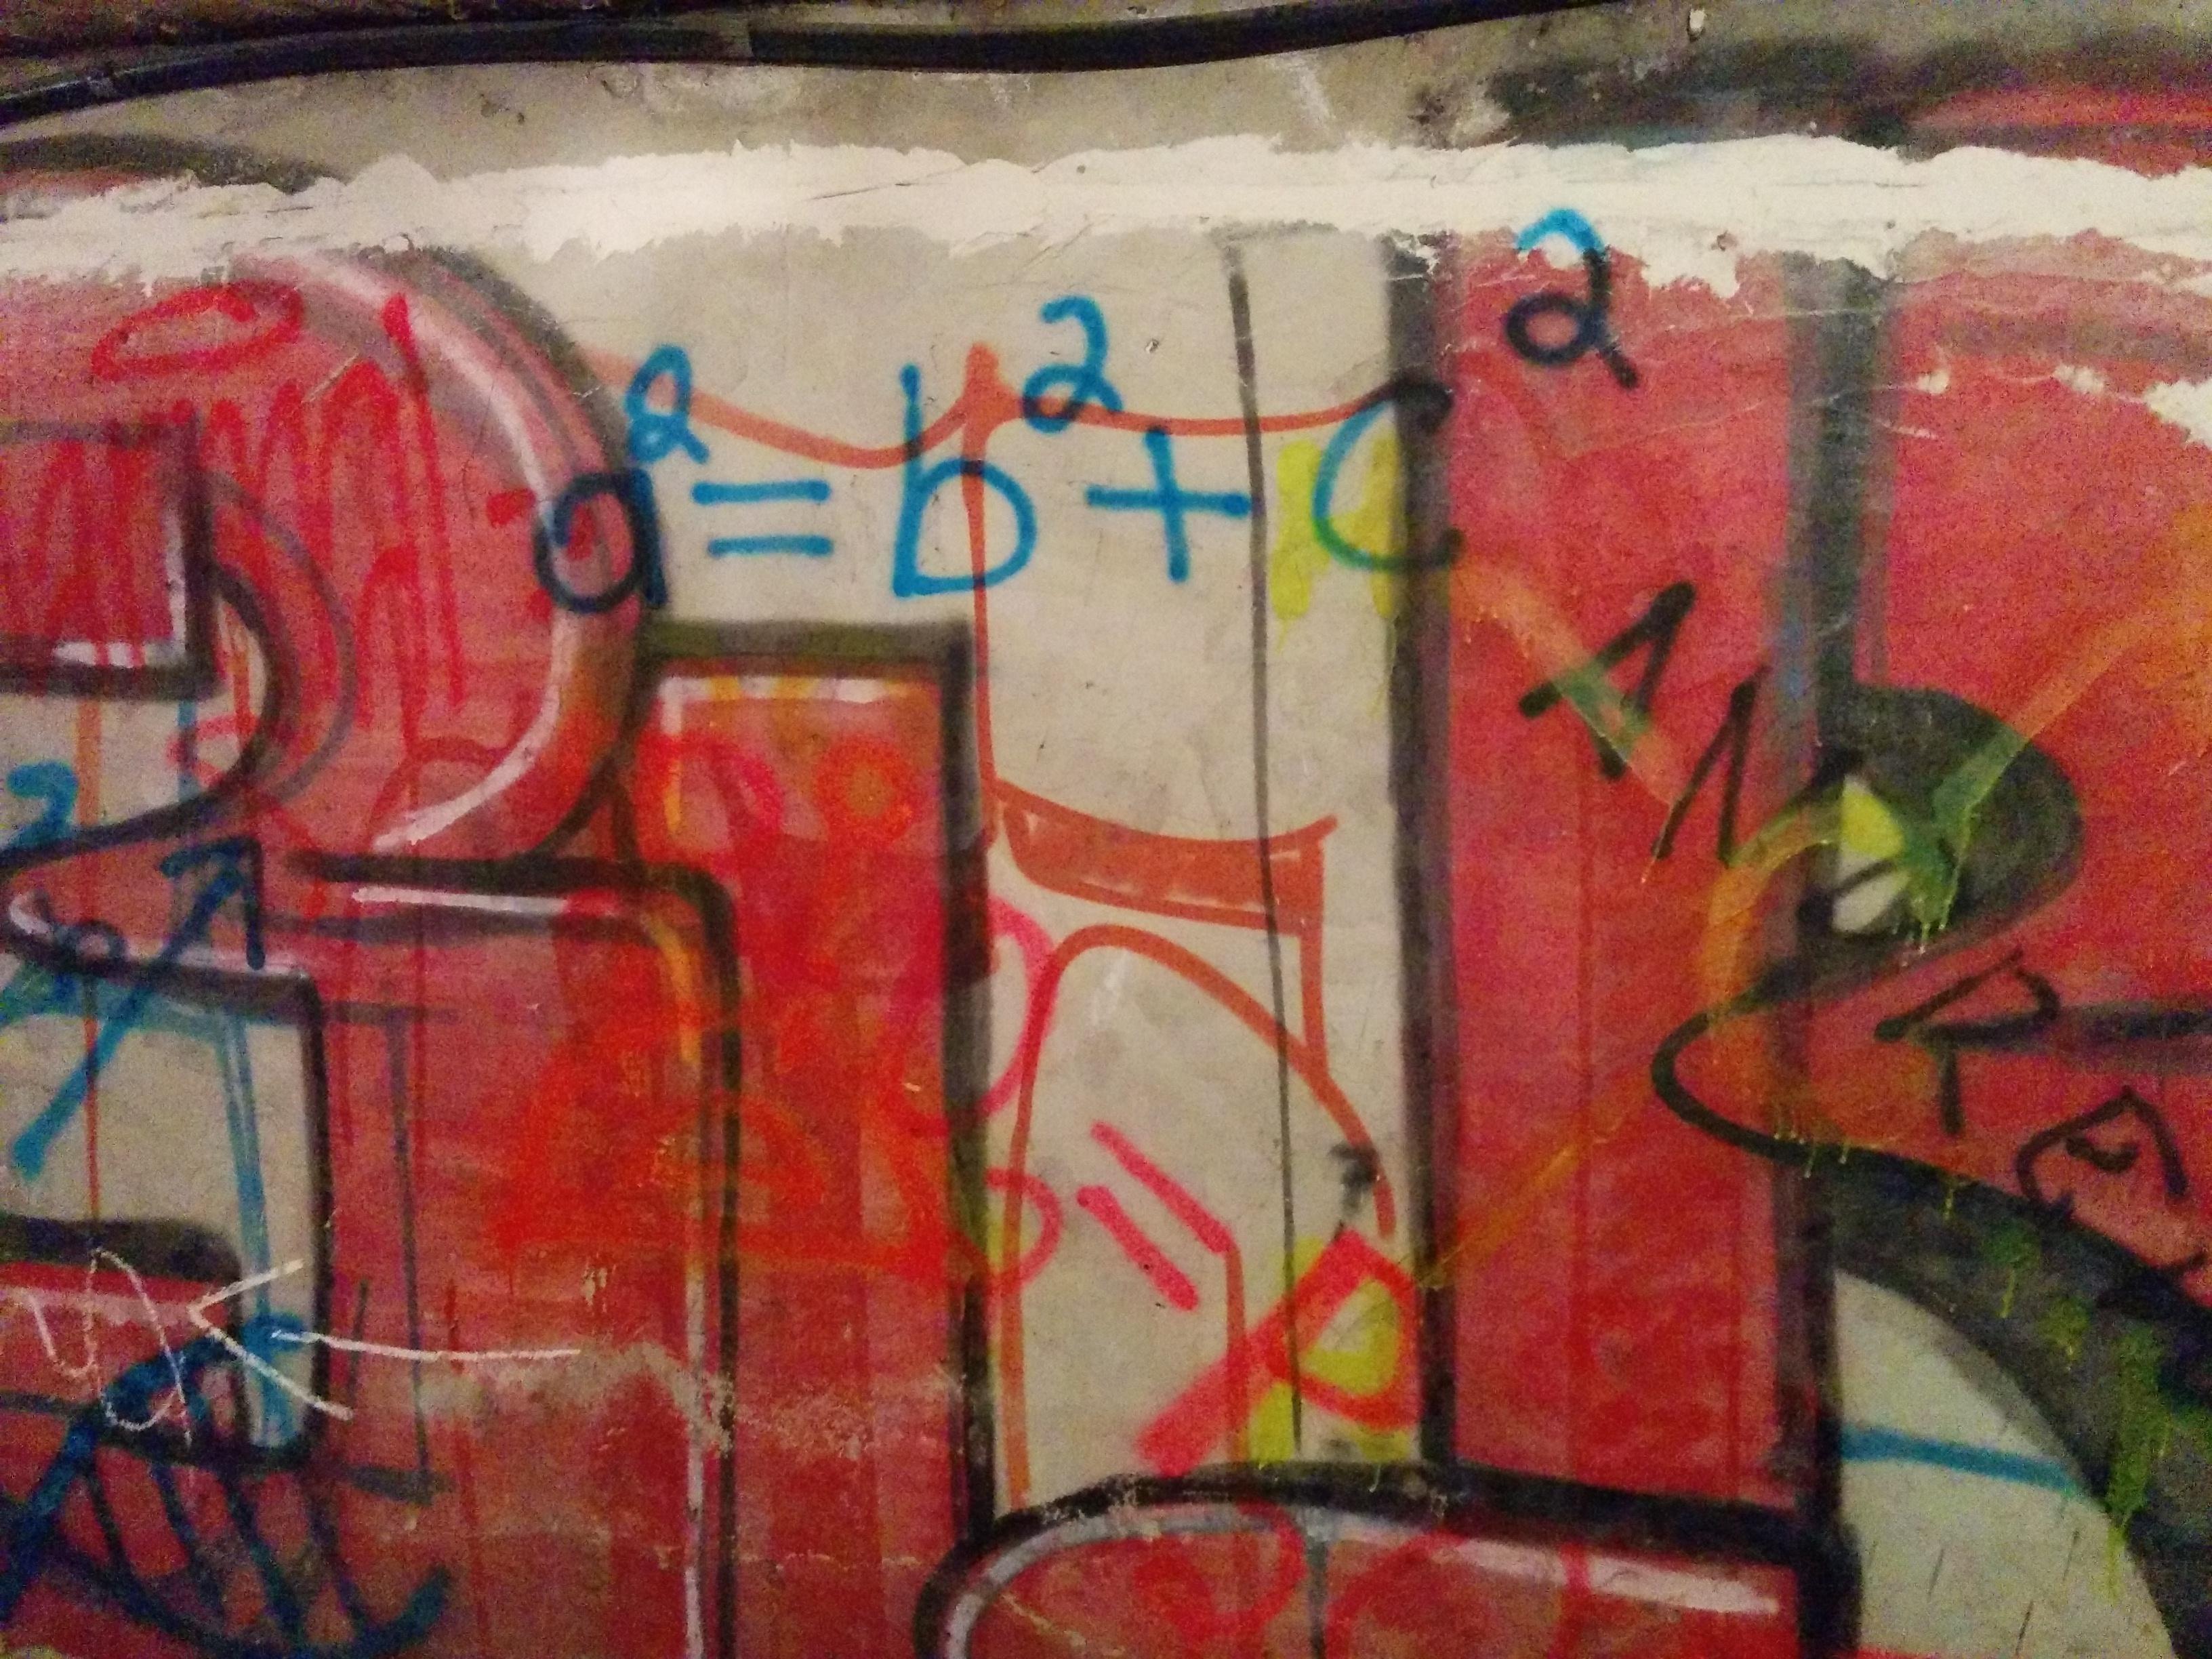 Graffiti in Chisinau. Pythagorean theorem.